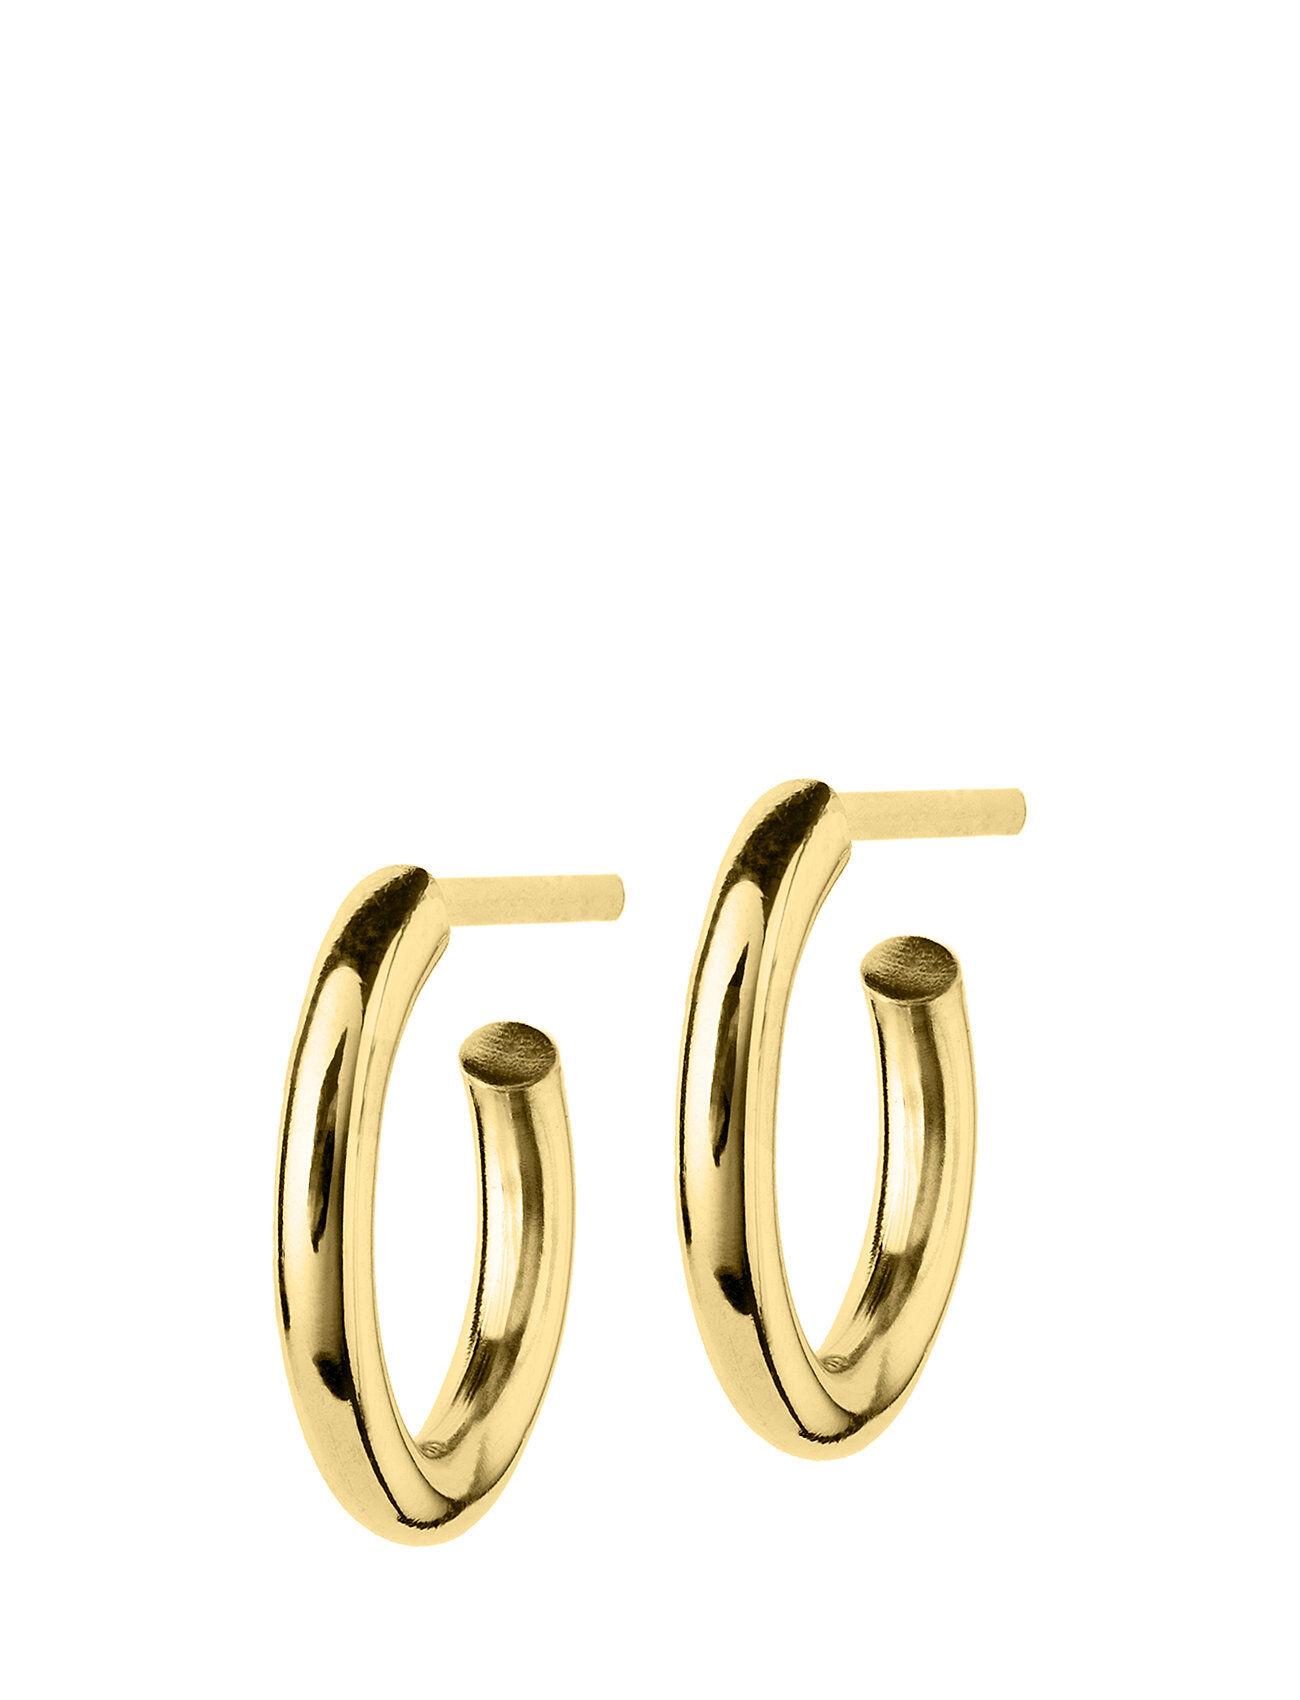 Edblad Hoops Earrings Gold Small Accessories Jewellery Earrings Studs Kulta Edblad